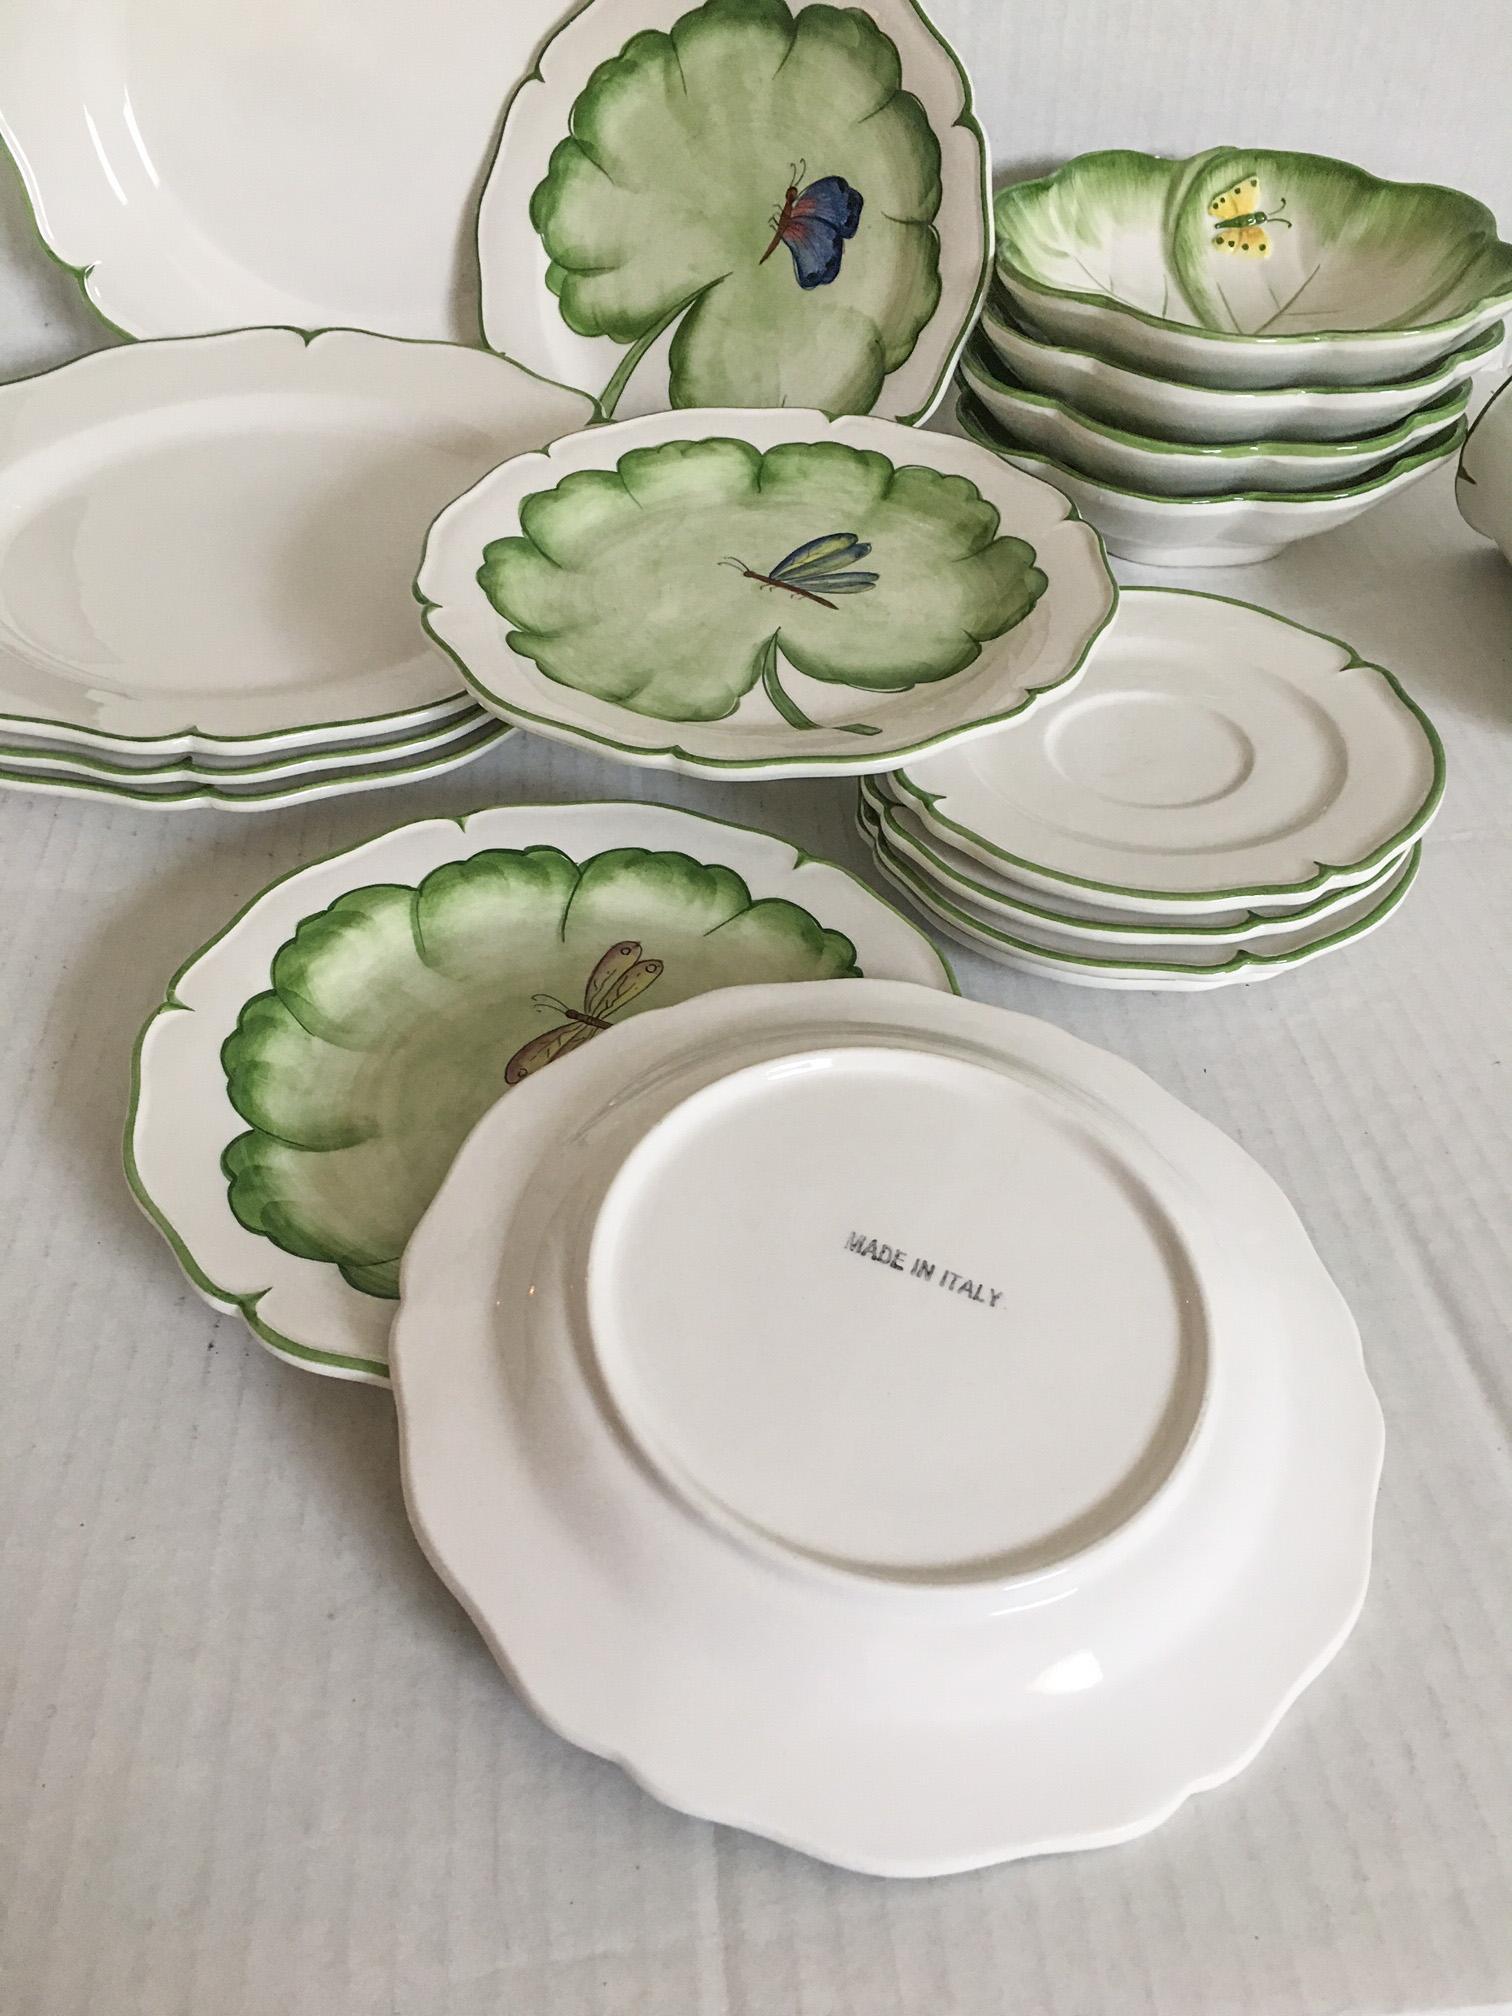 Anna Weatherley-Style Italian Dinnerware - Service for 4 - Image 8 of 8  sc 1 st  Chairish & Anna Weatherley-Style Italian Dinnerware - Service for 4   Chairish